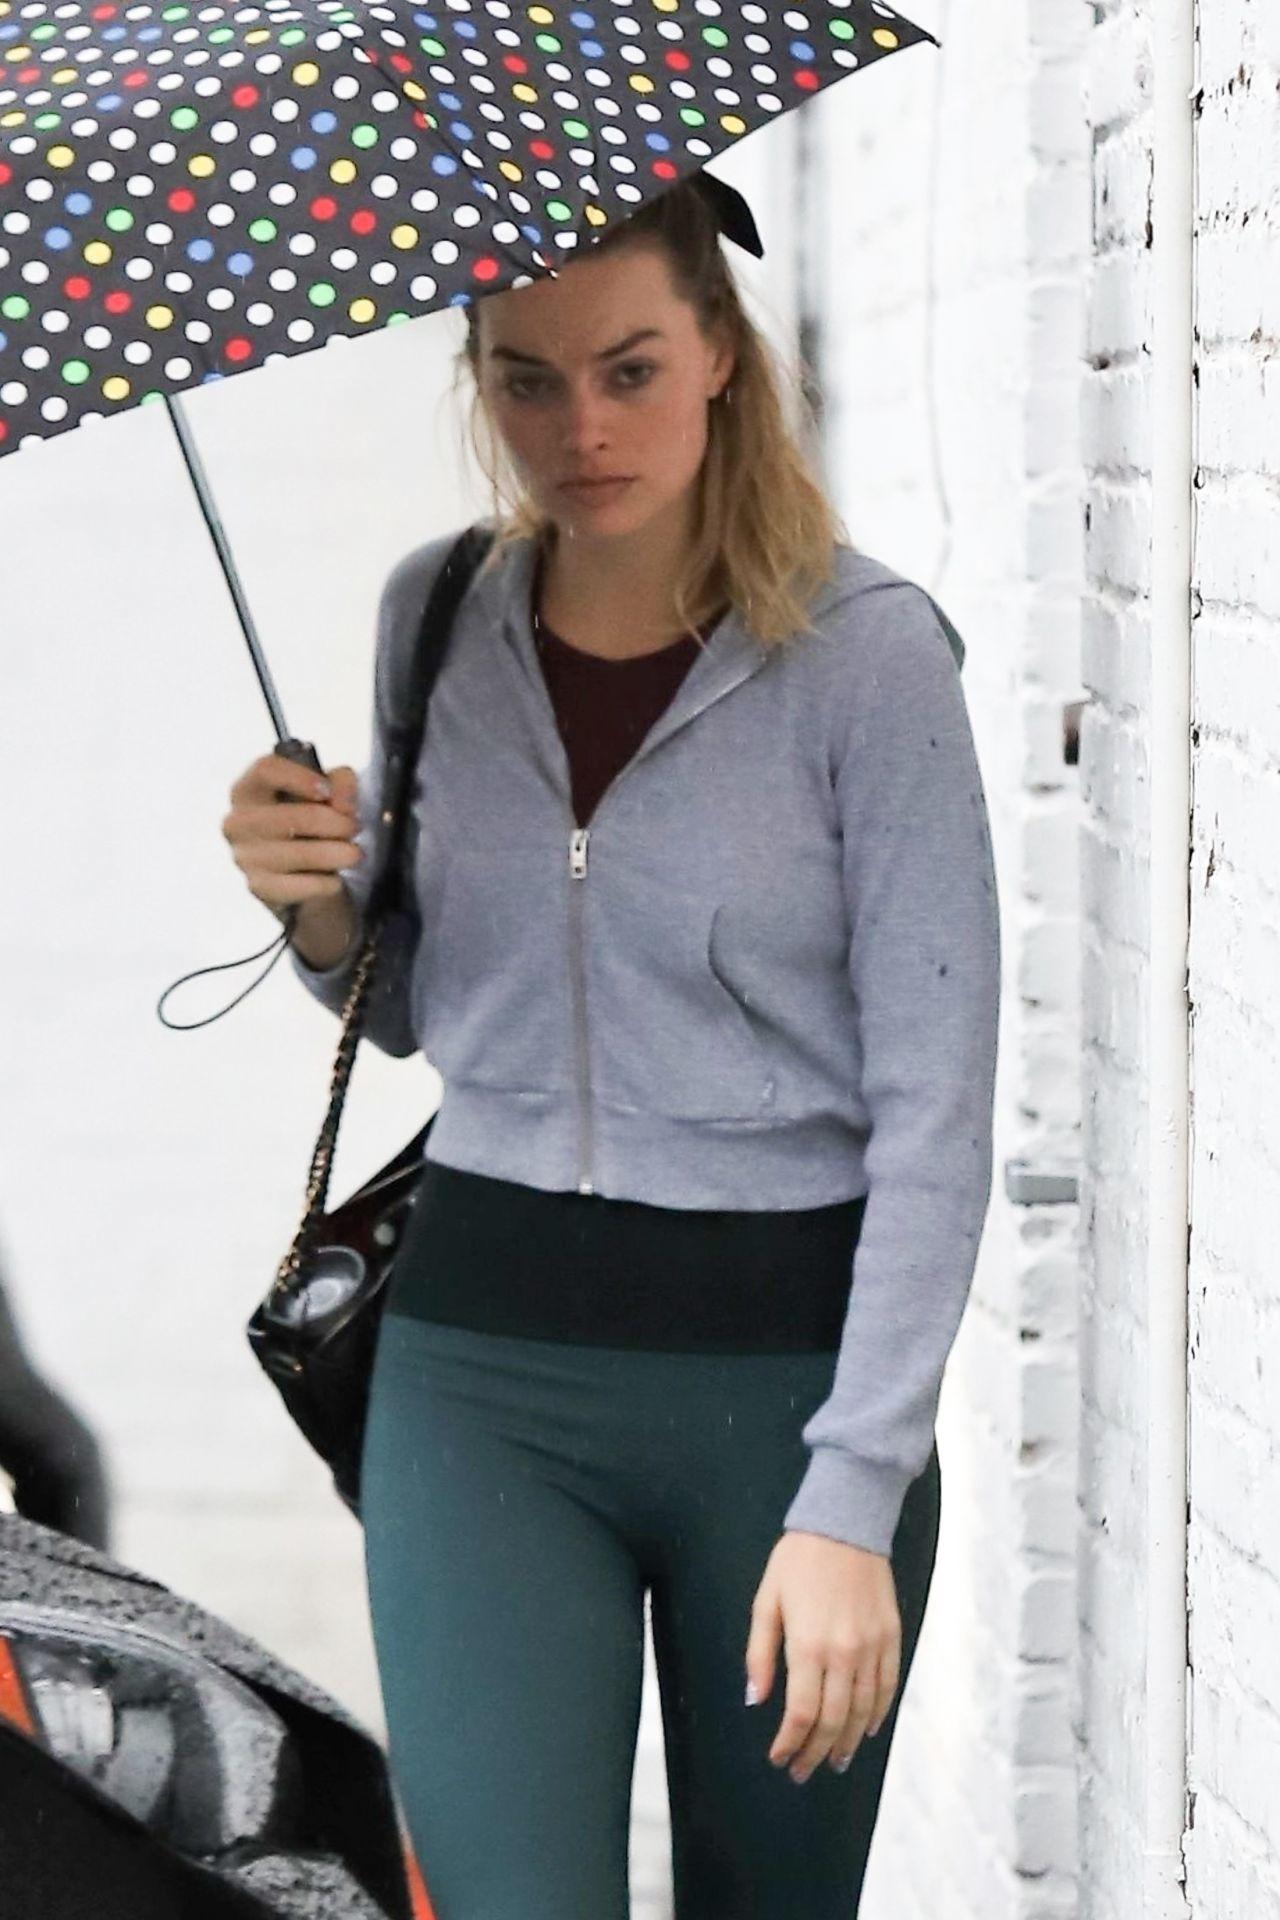 Margot Robbie Heading To The Gym In La 02 03 2019